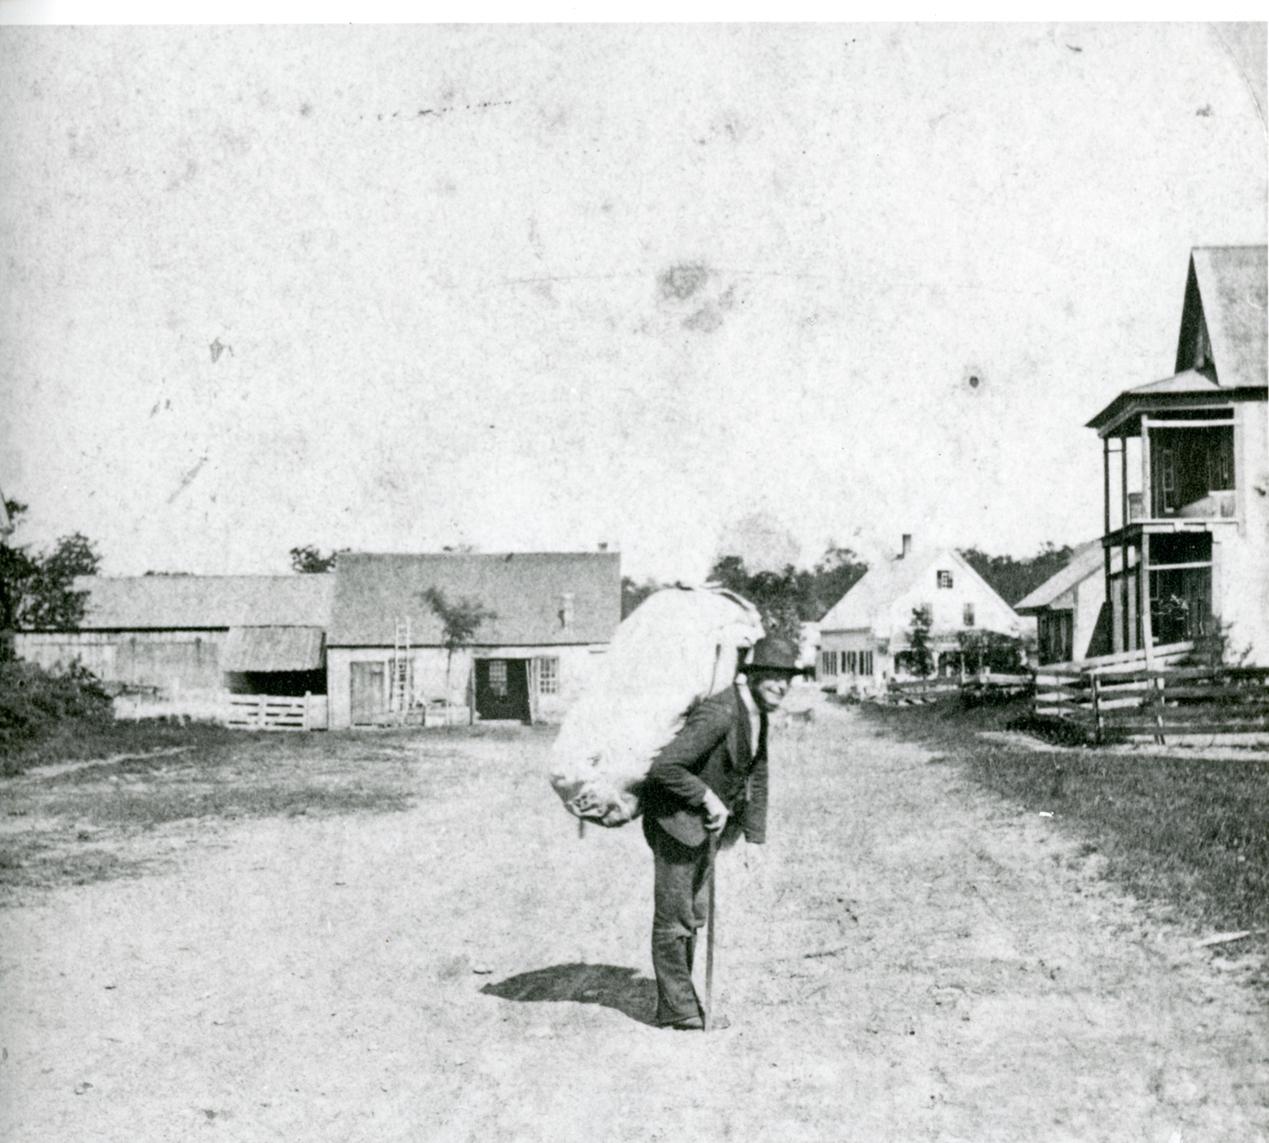 Jewish peddler in Westmoreland, NH